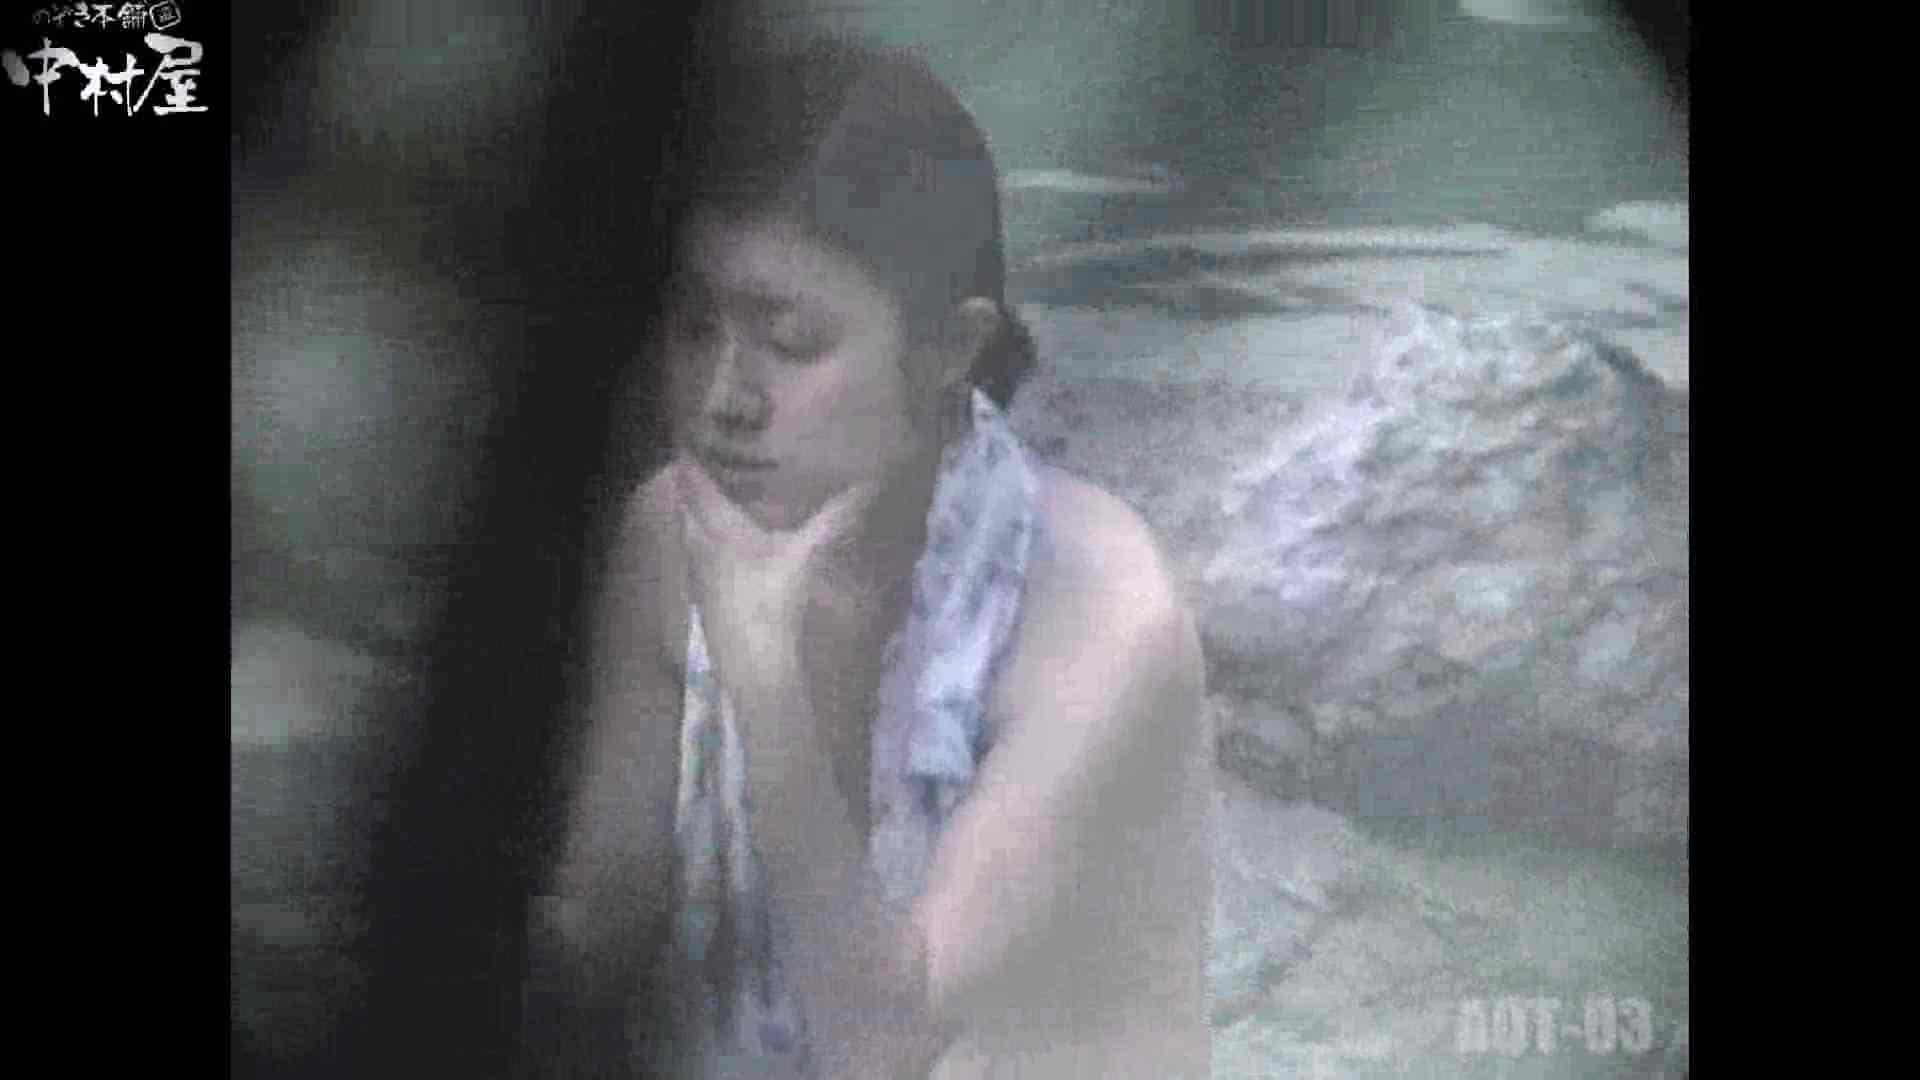 Aquaな露天風呂Vol.867潜入盗撮露天風呂参判湯 其の八 OLのエロ生活 性交動画流出 103連発 18